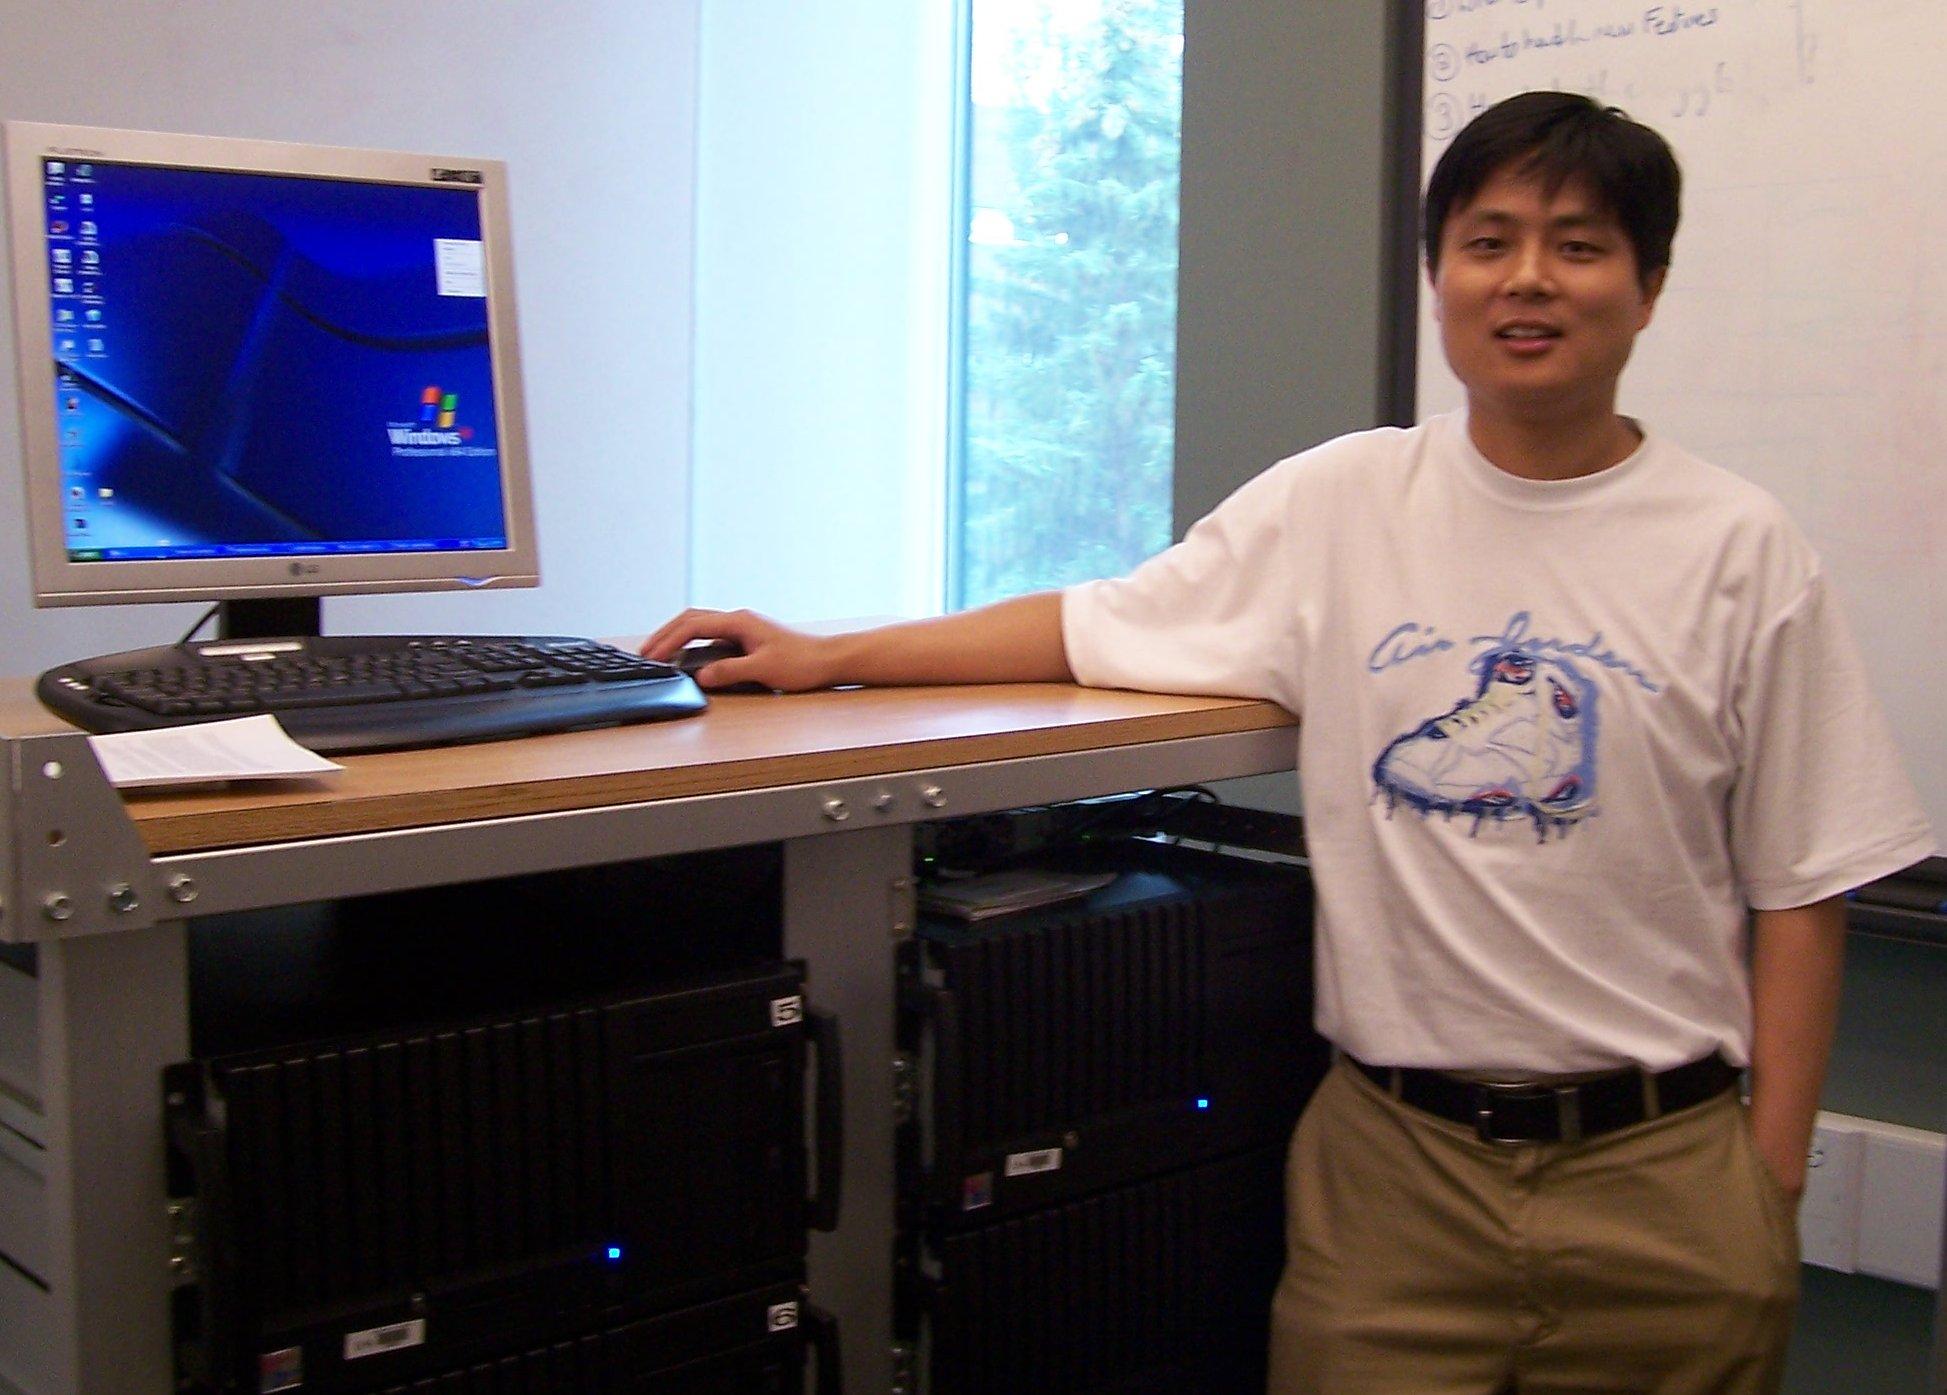 Cheng l ph d dissertation 2008